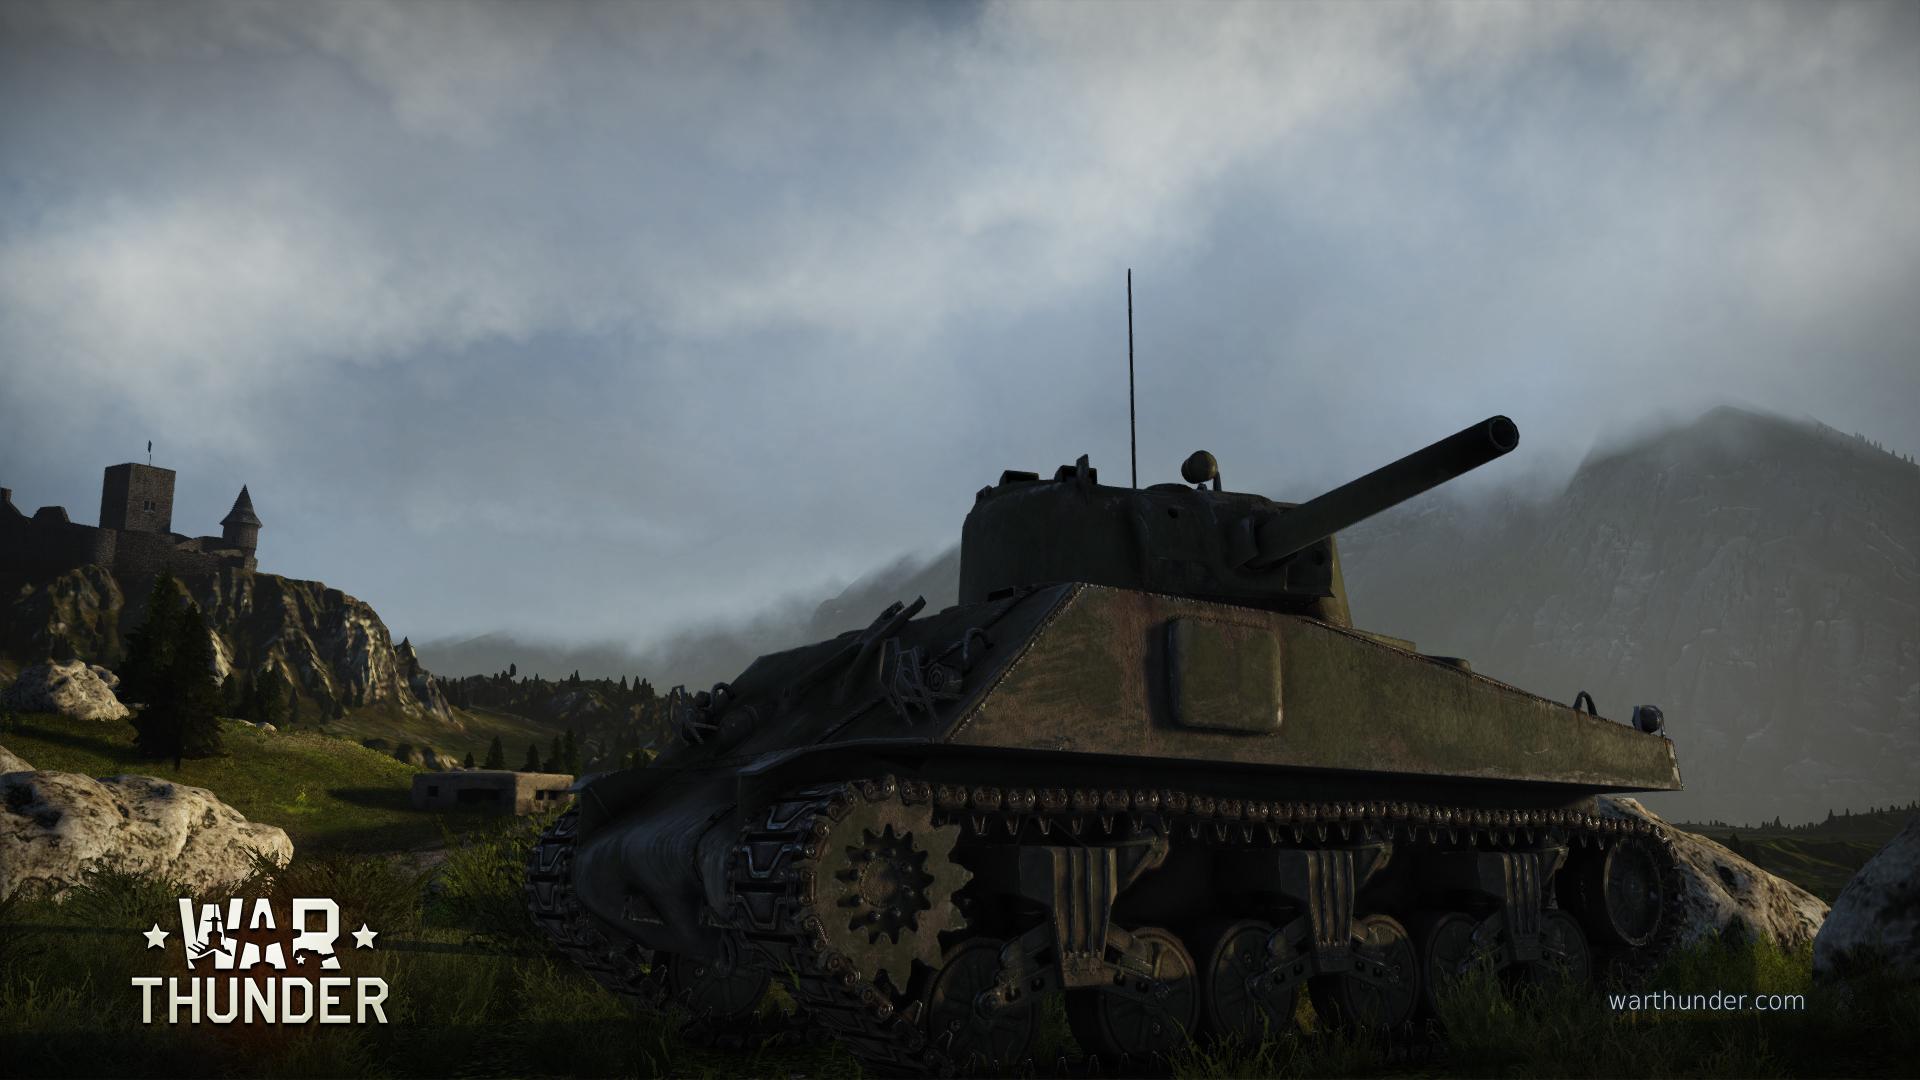 http://warthunder.ru/upload/image/media/screenshots/shot%202013_05_14%2020_46_52.jpg